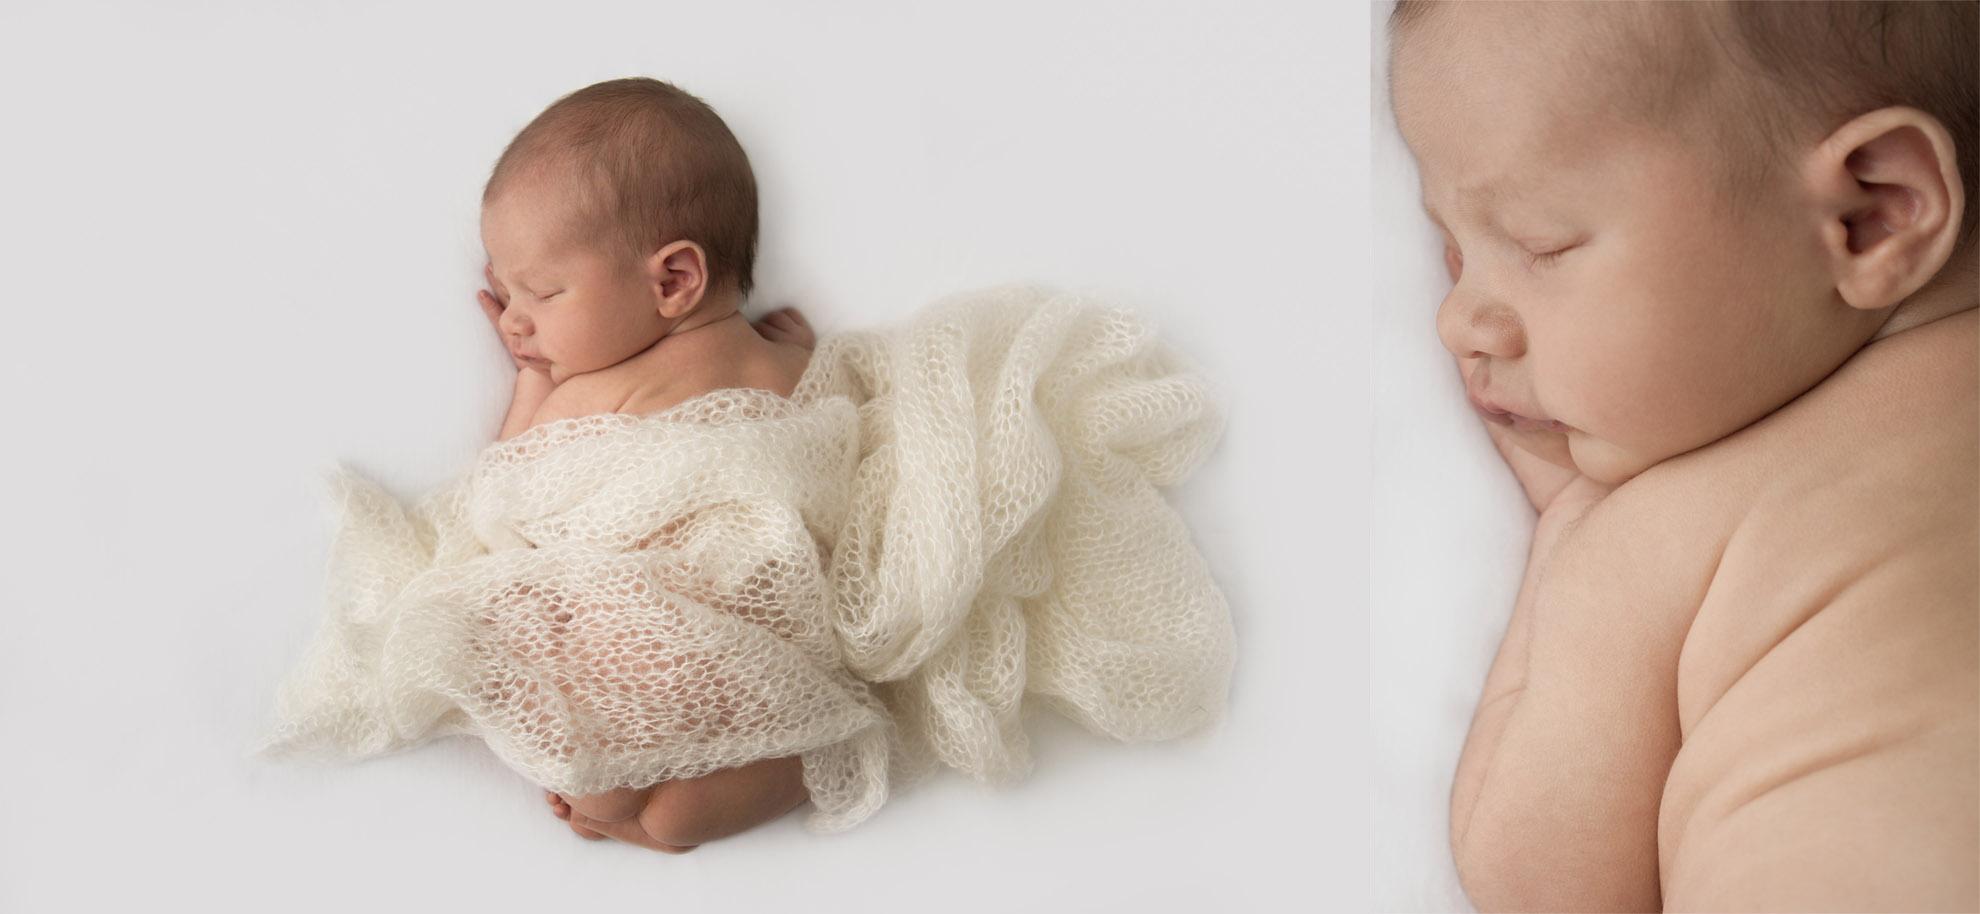 Hamilton-newborn-photographer-baby-with-cream-wrap.jpg